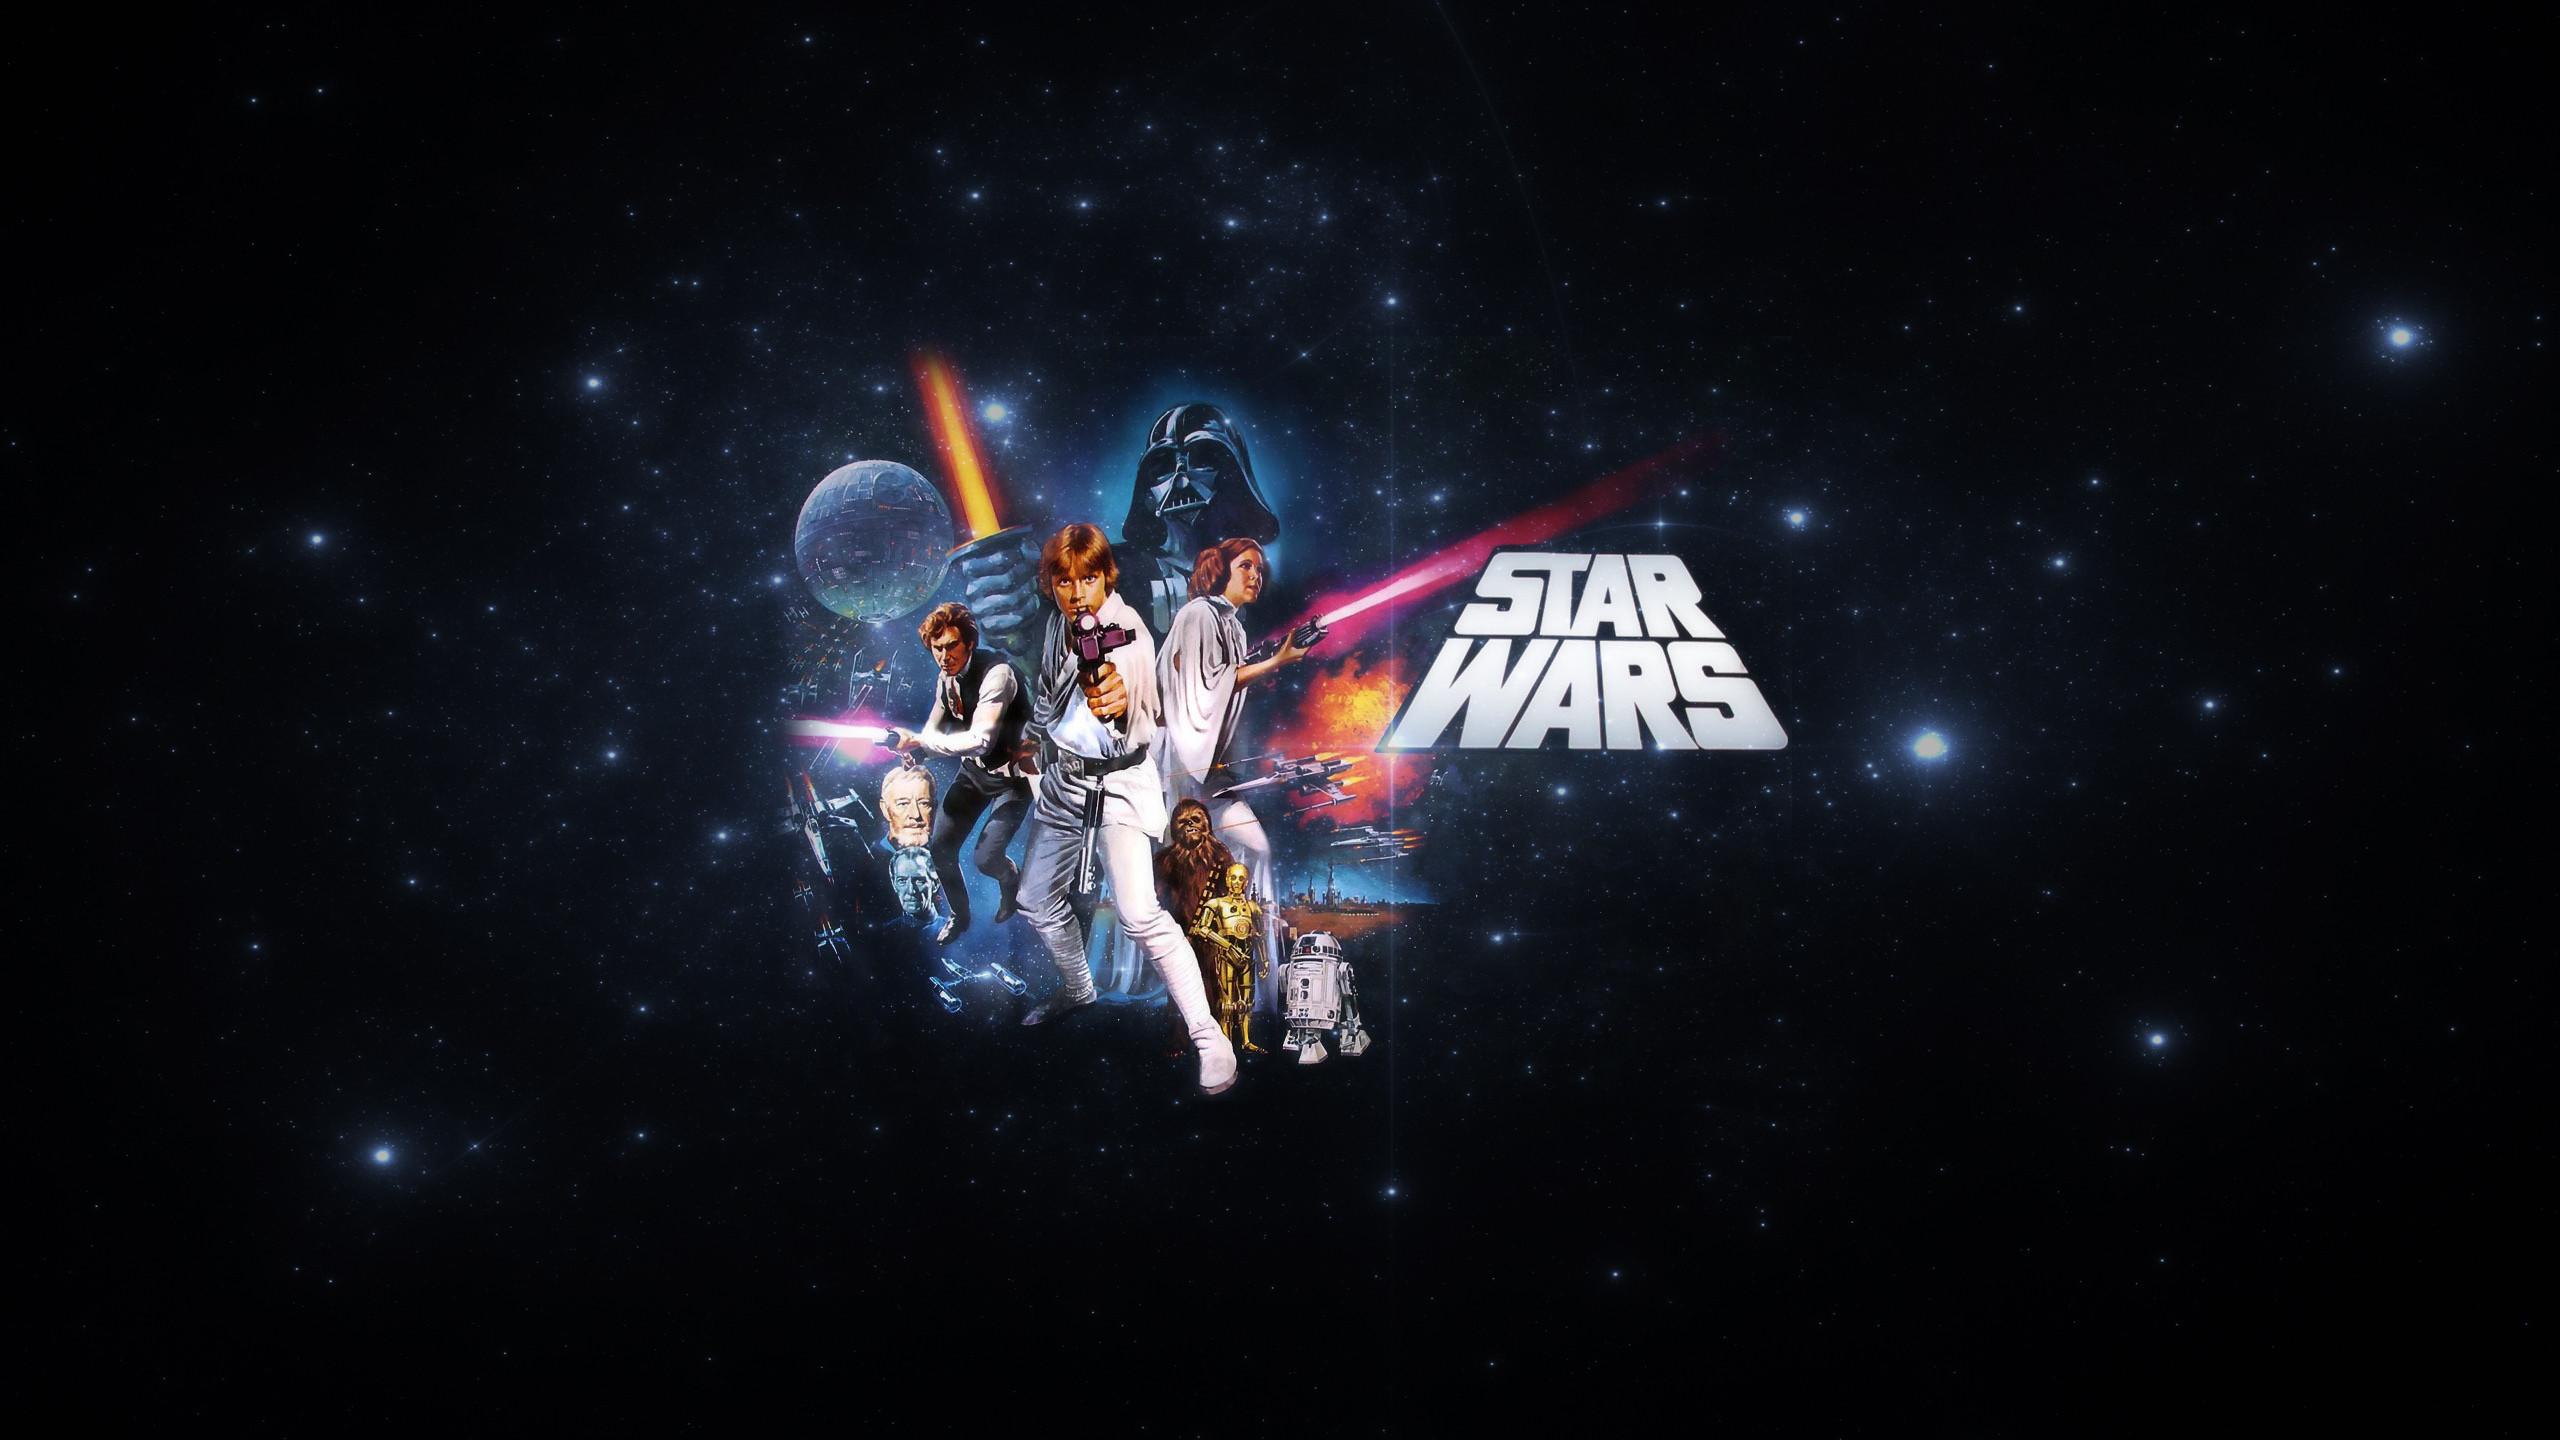 2560x1440 star wars animated wallpaper - weddingdressin.com